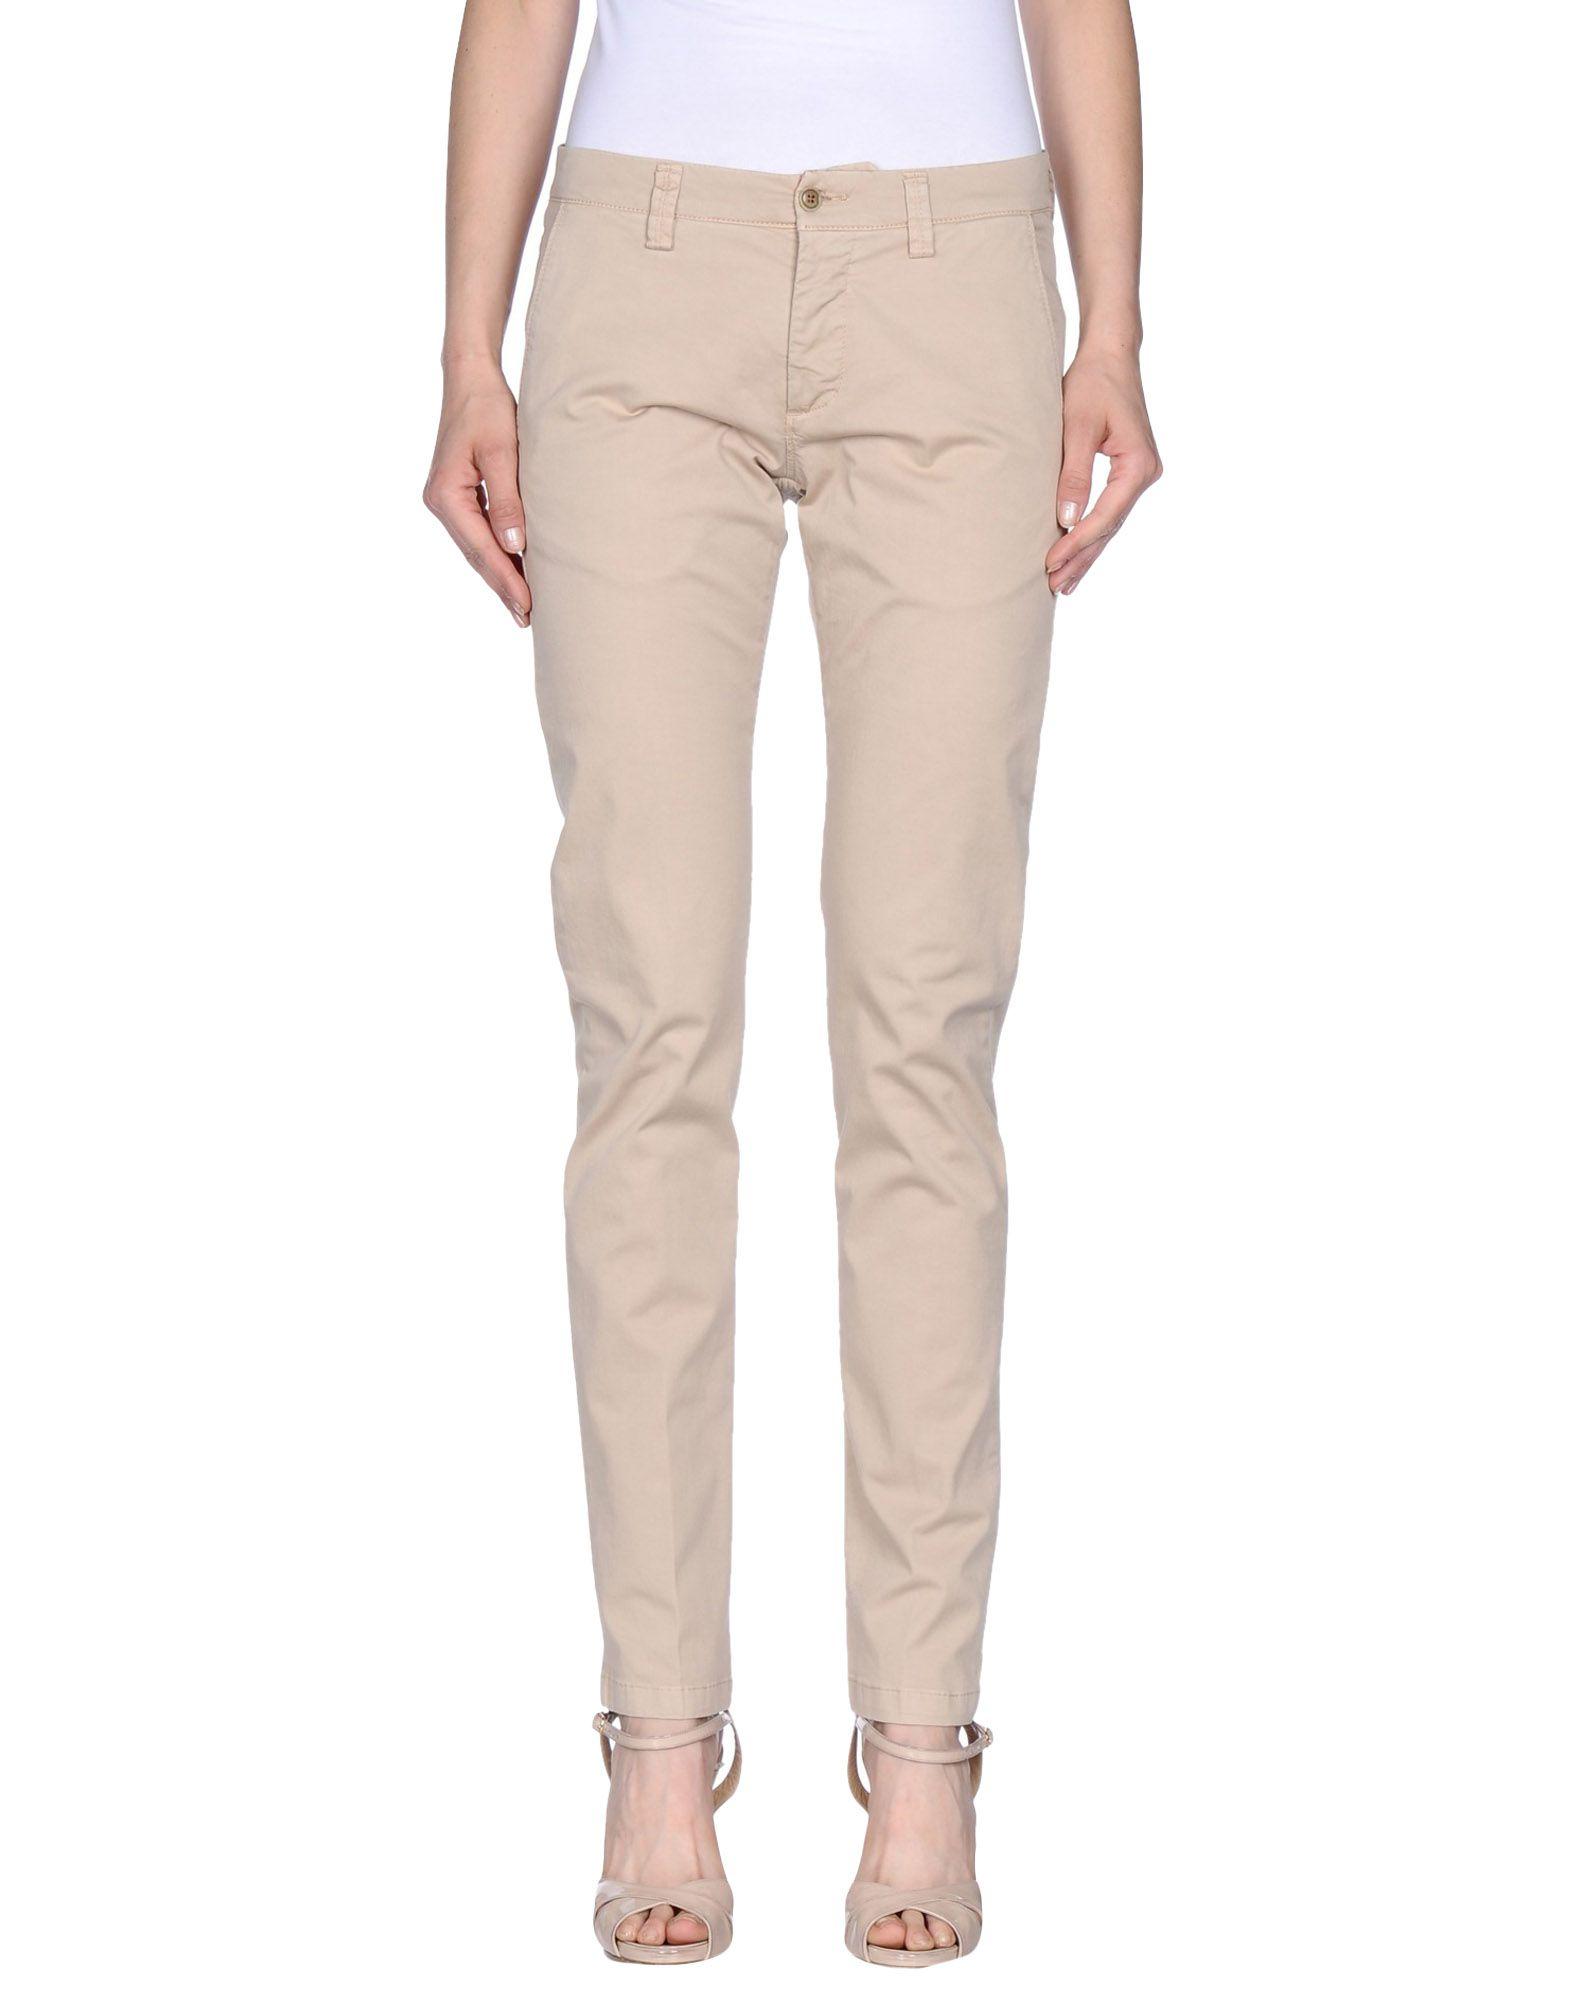 MASSIMO REBECCHI Повседневные брюки женские брюки spain massimo dutti 6623923 massimo dutti